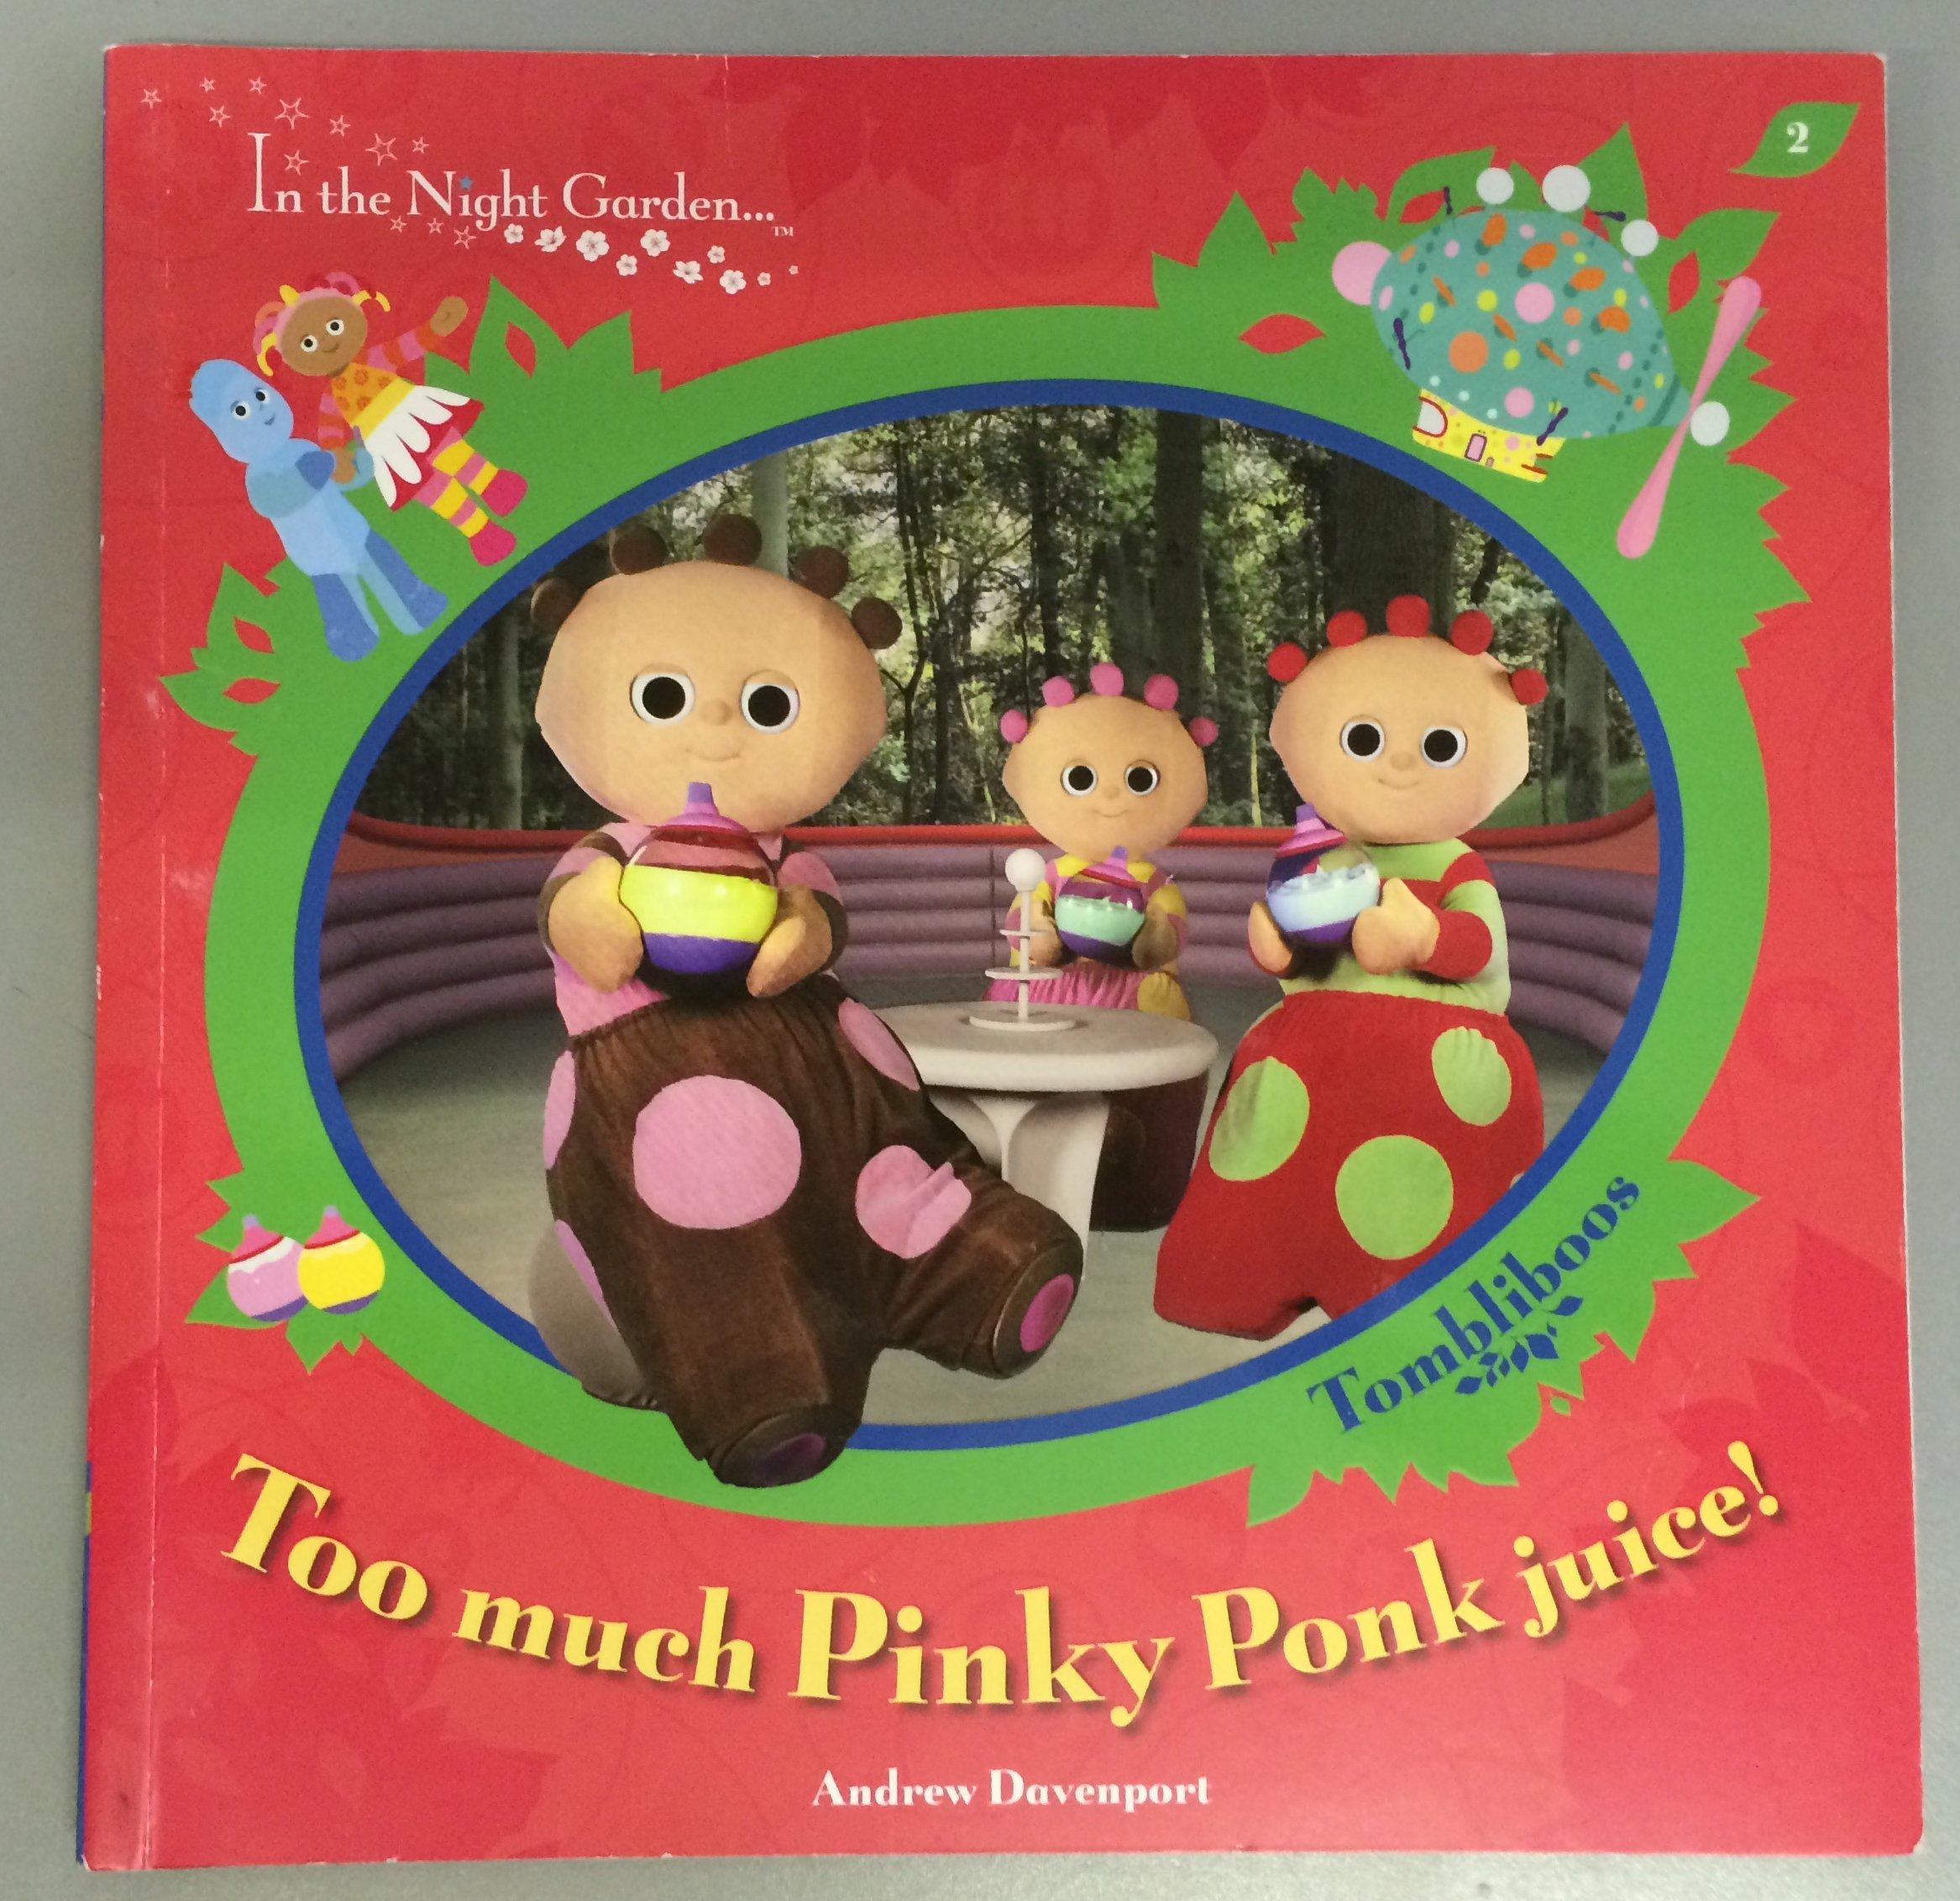 In The Night Garden: Too Much Pinky Ponk Juice! Paperback – 1 Oct 2008